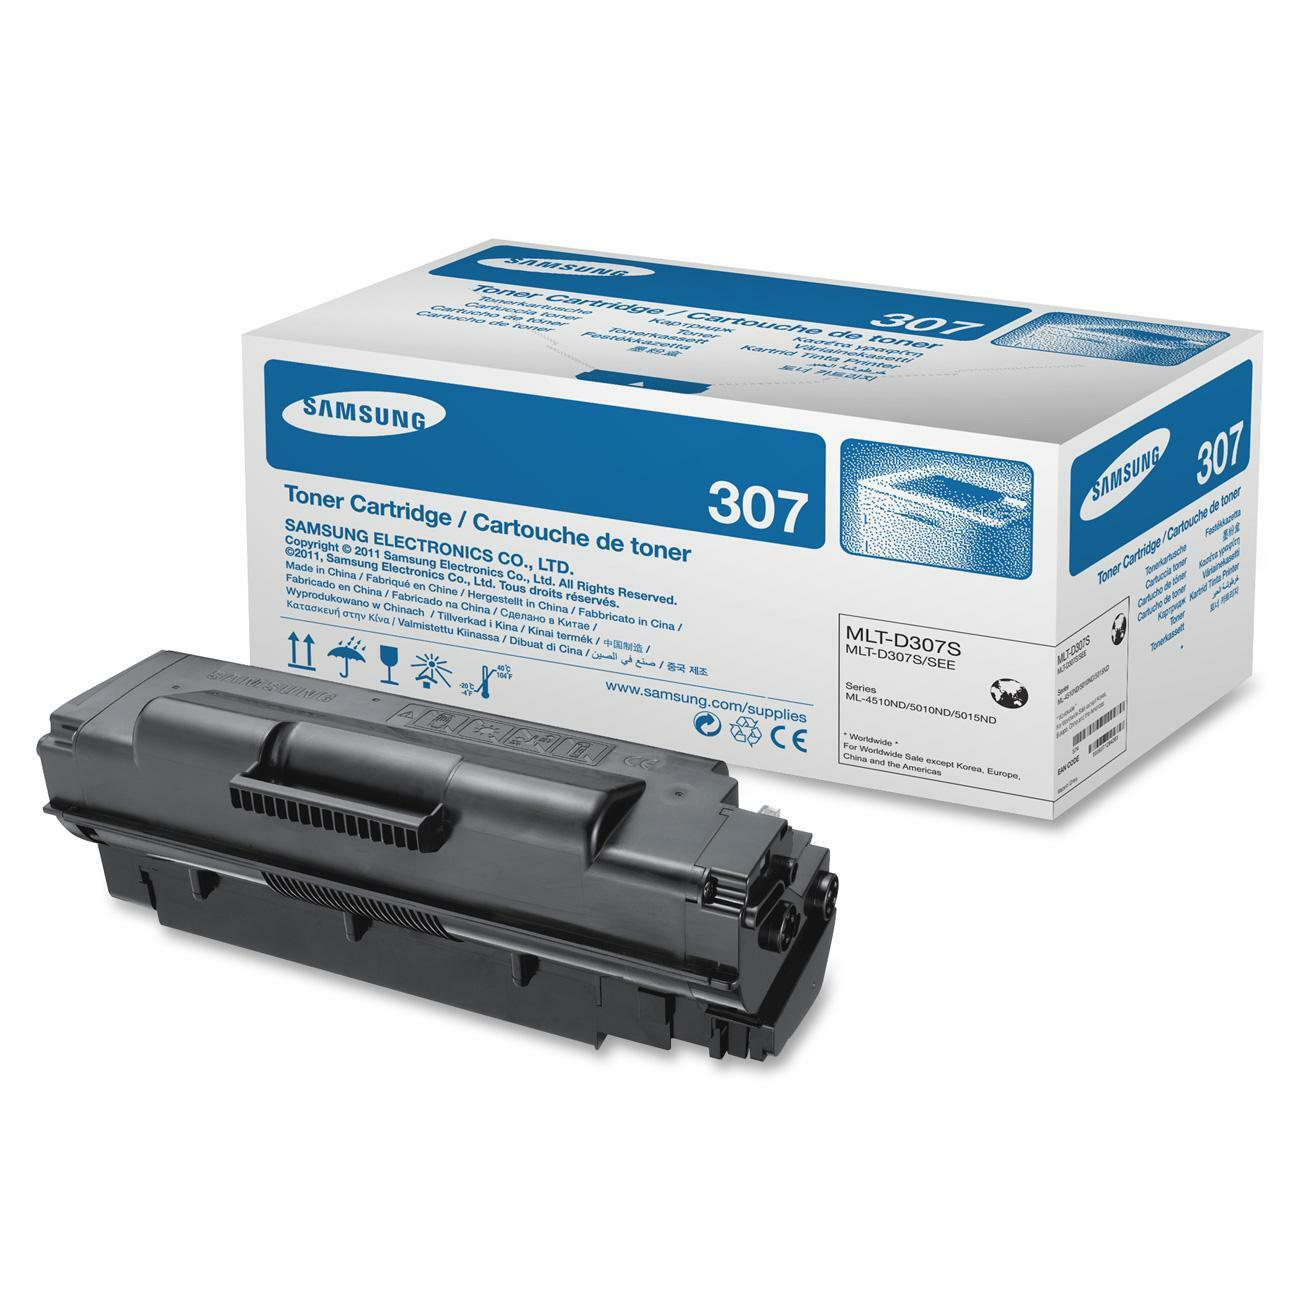 Toner For Ml-4512Nd Ml-5012Nd Tonrml-5017Nd 7K Yield